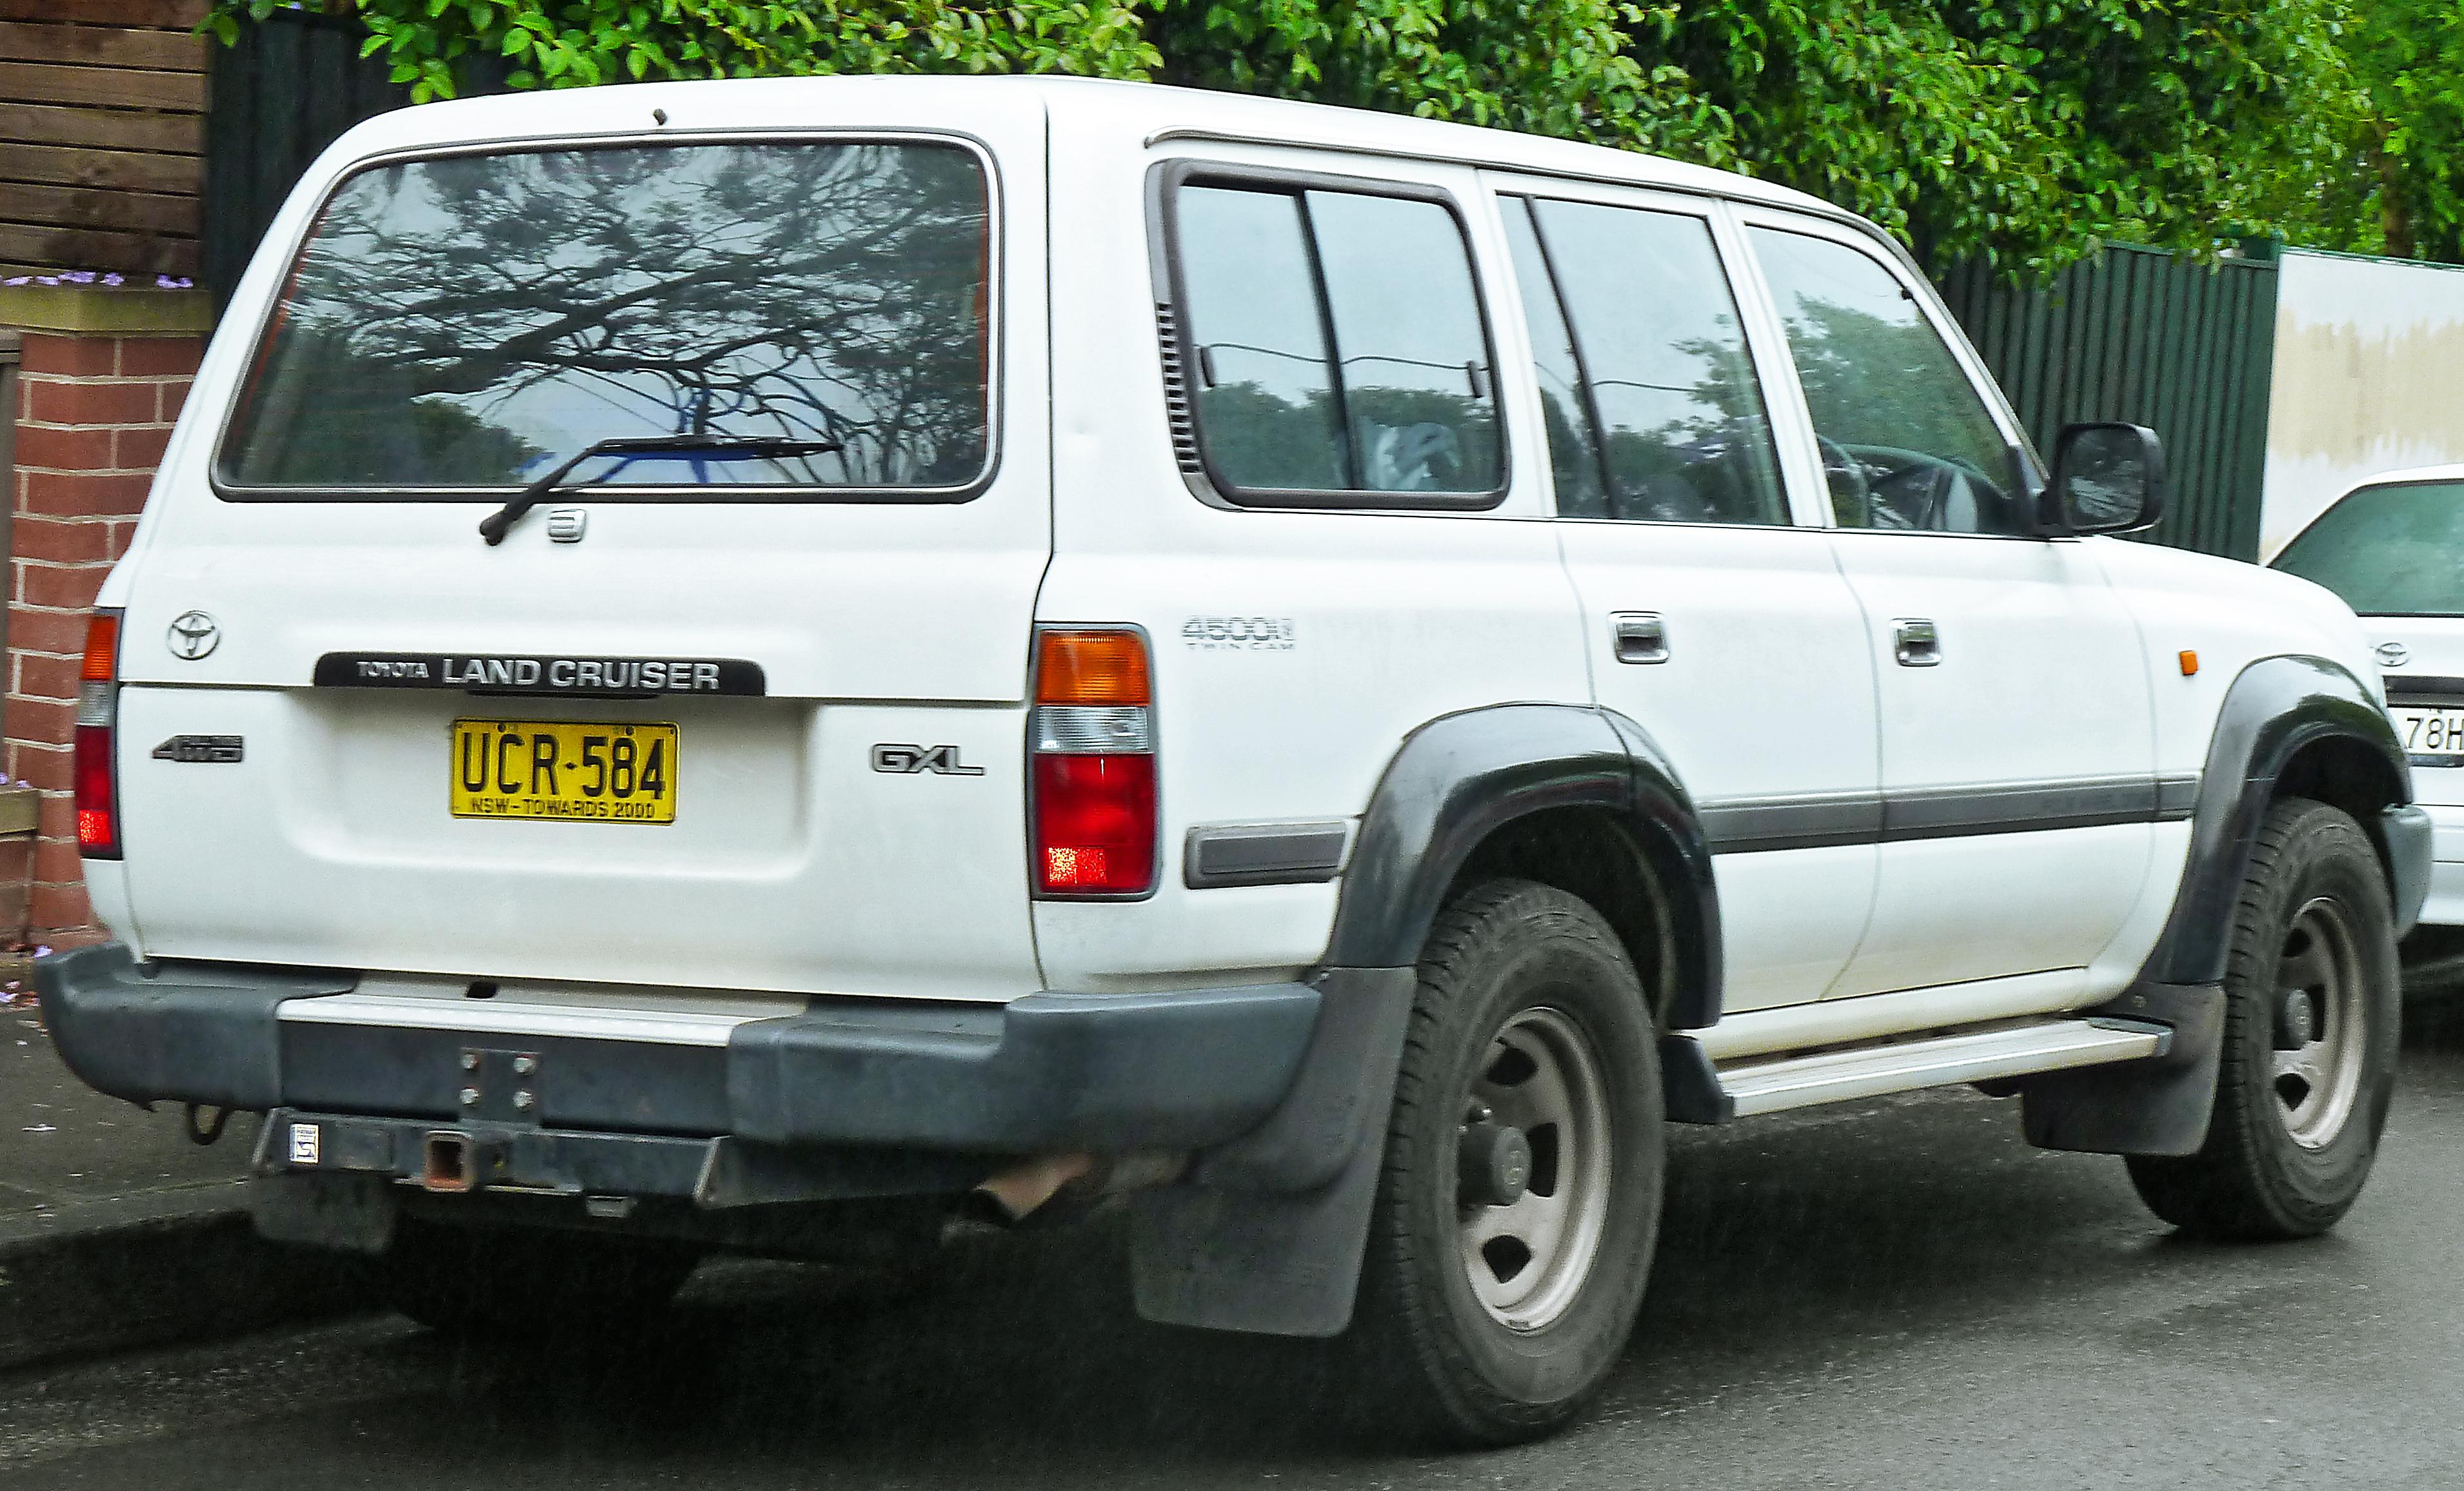 File 1995 1998 Toyota Land Cruiser Fzj80r Gxl Wagon 2011 11 17 02 Jpg Wikimedia Commons